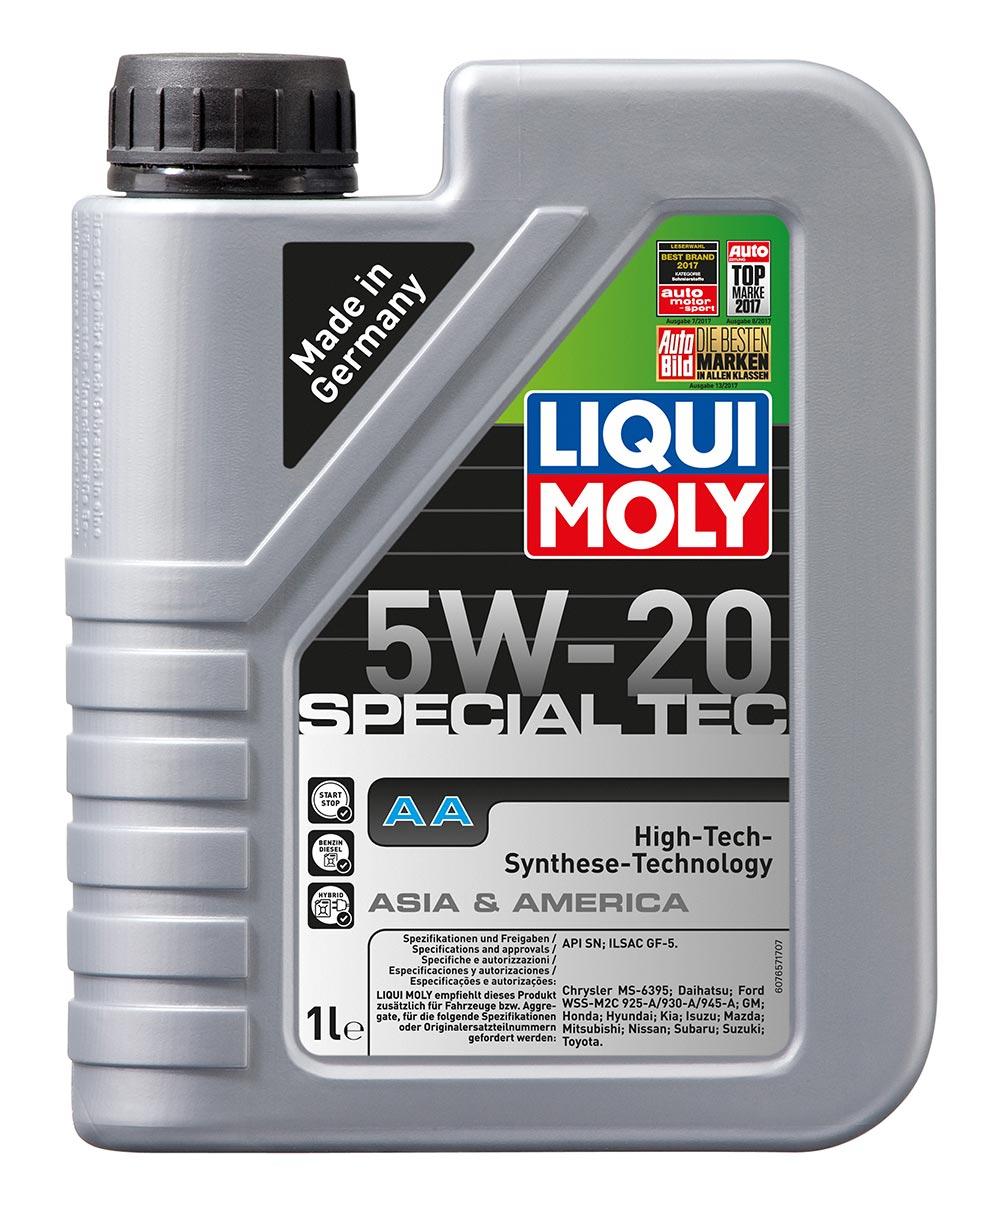 Масло моторное синт. 5W20 Special Tec AA 1л API SN ILSAC GF-5 Chrysler MS-6395 F